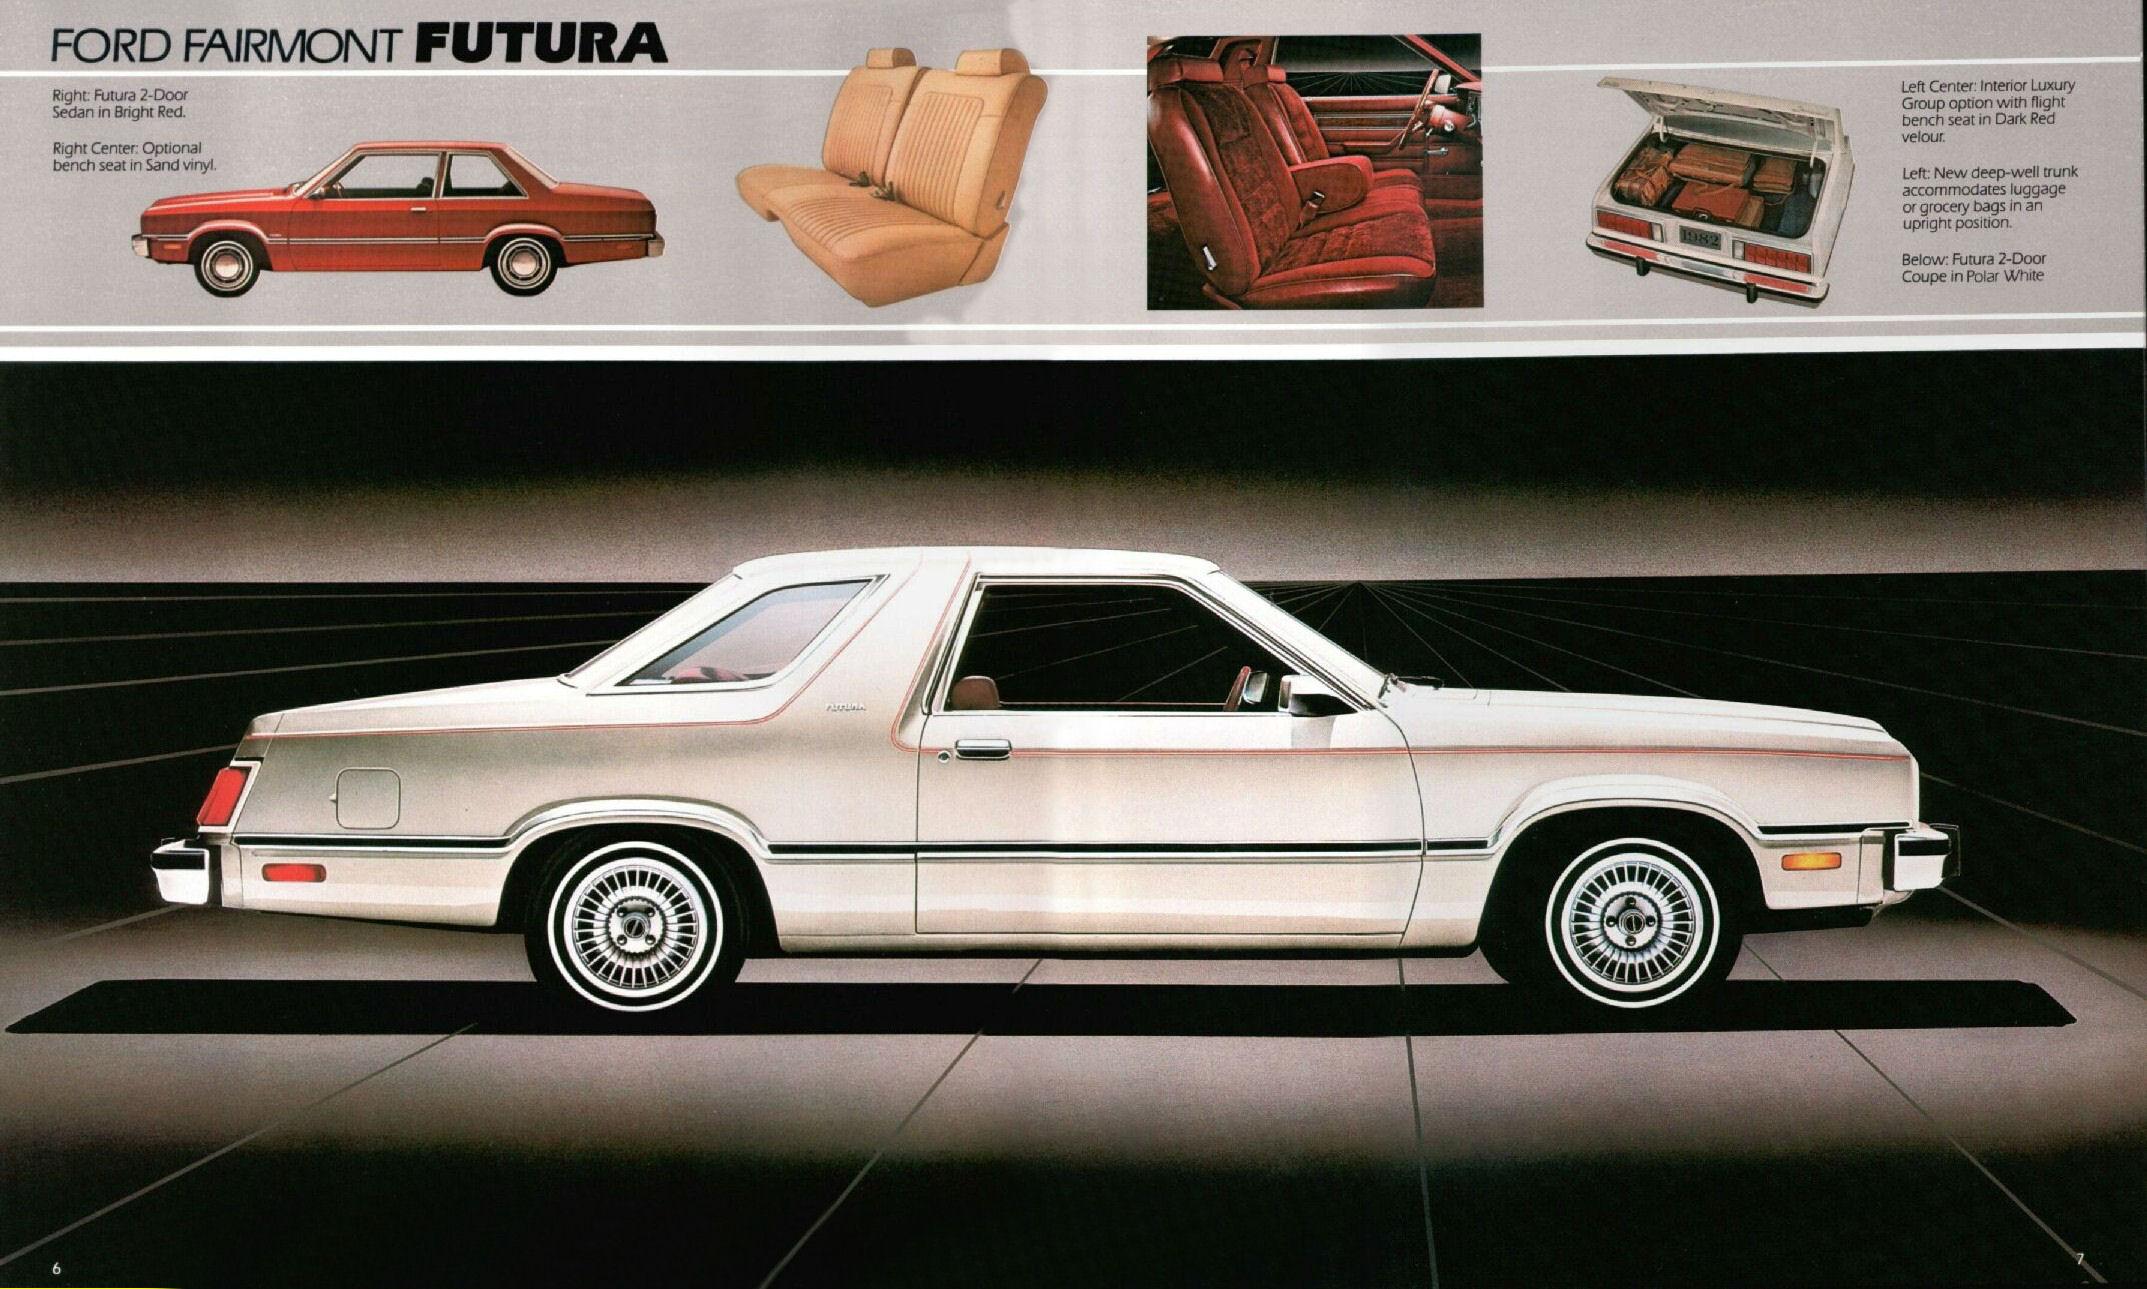 1982 Ford Fairmont Futura Brochure